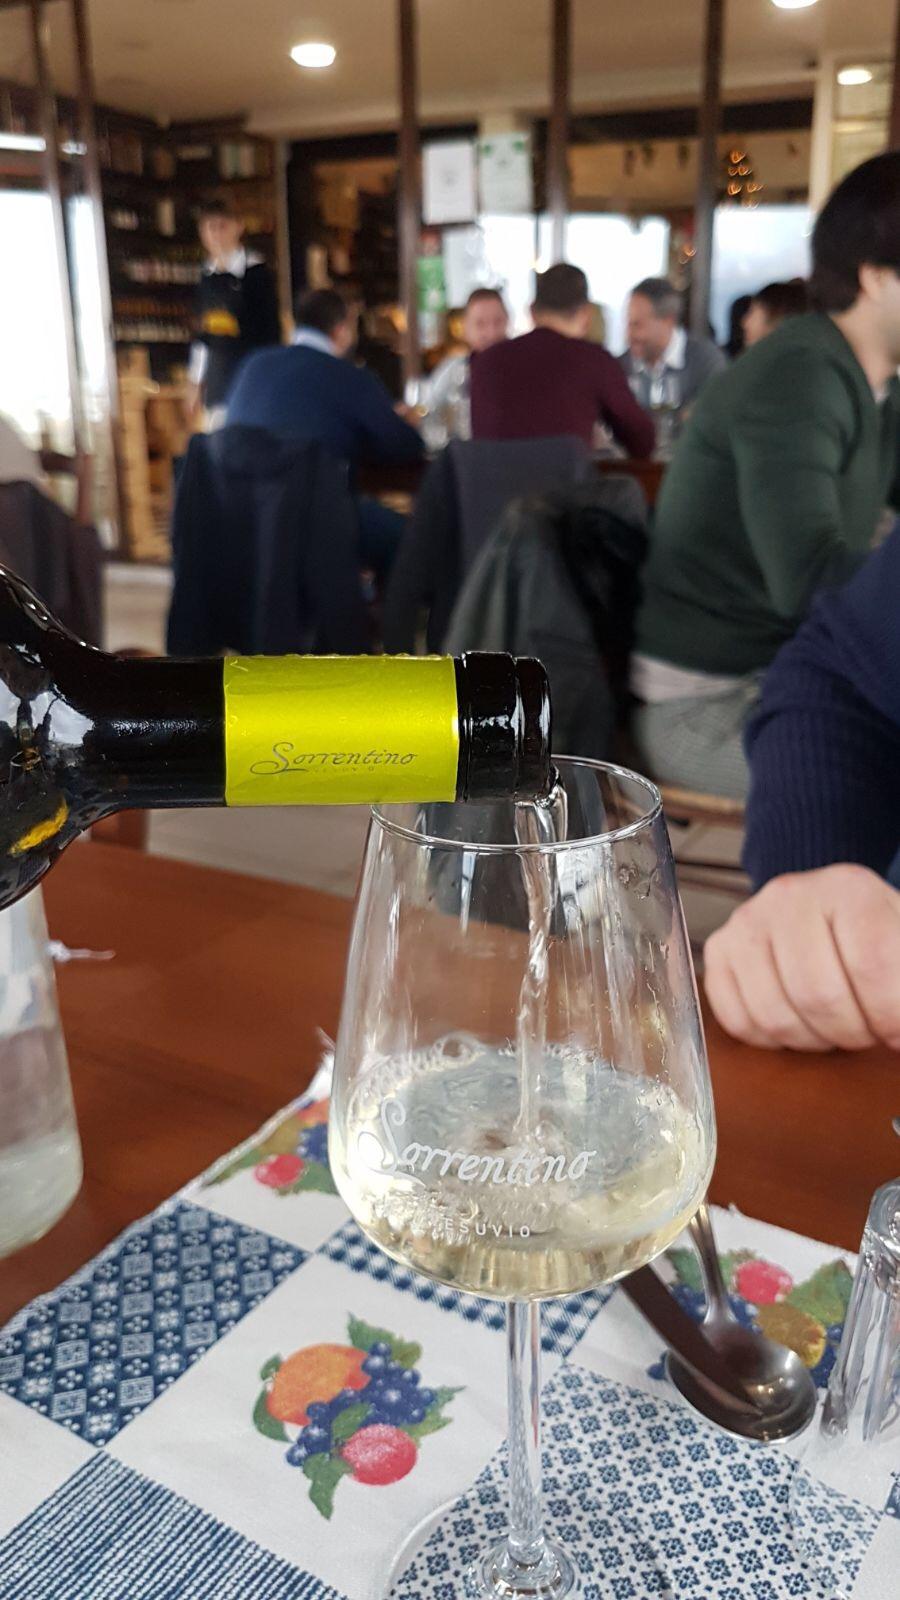 English To Italian Translator Google: Half Day Pompeii Tour With Wine Tasting Lunch